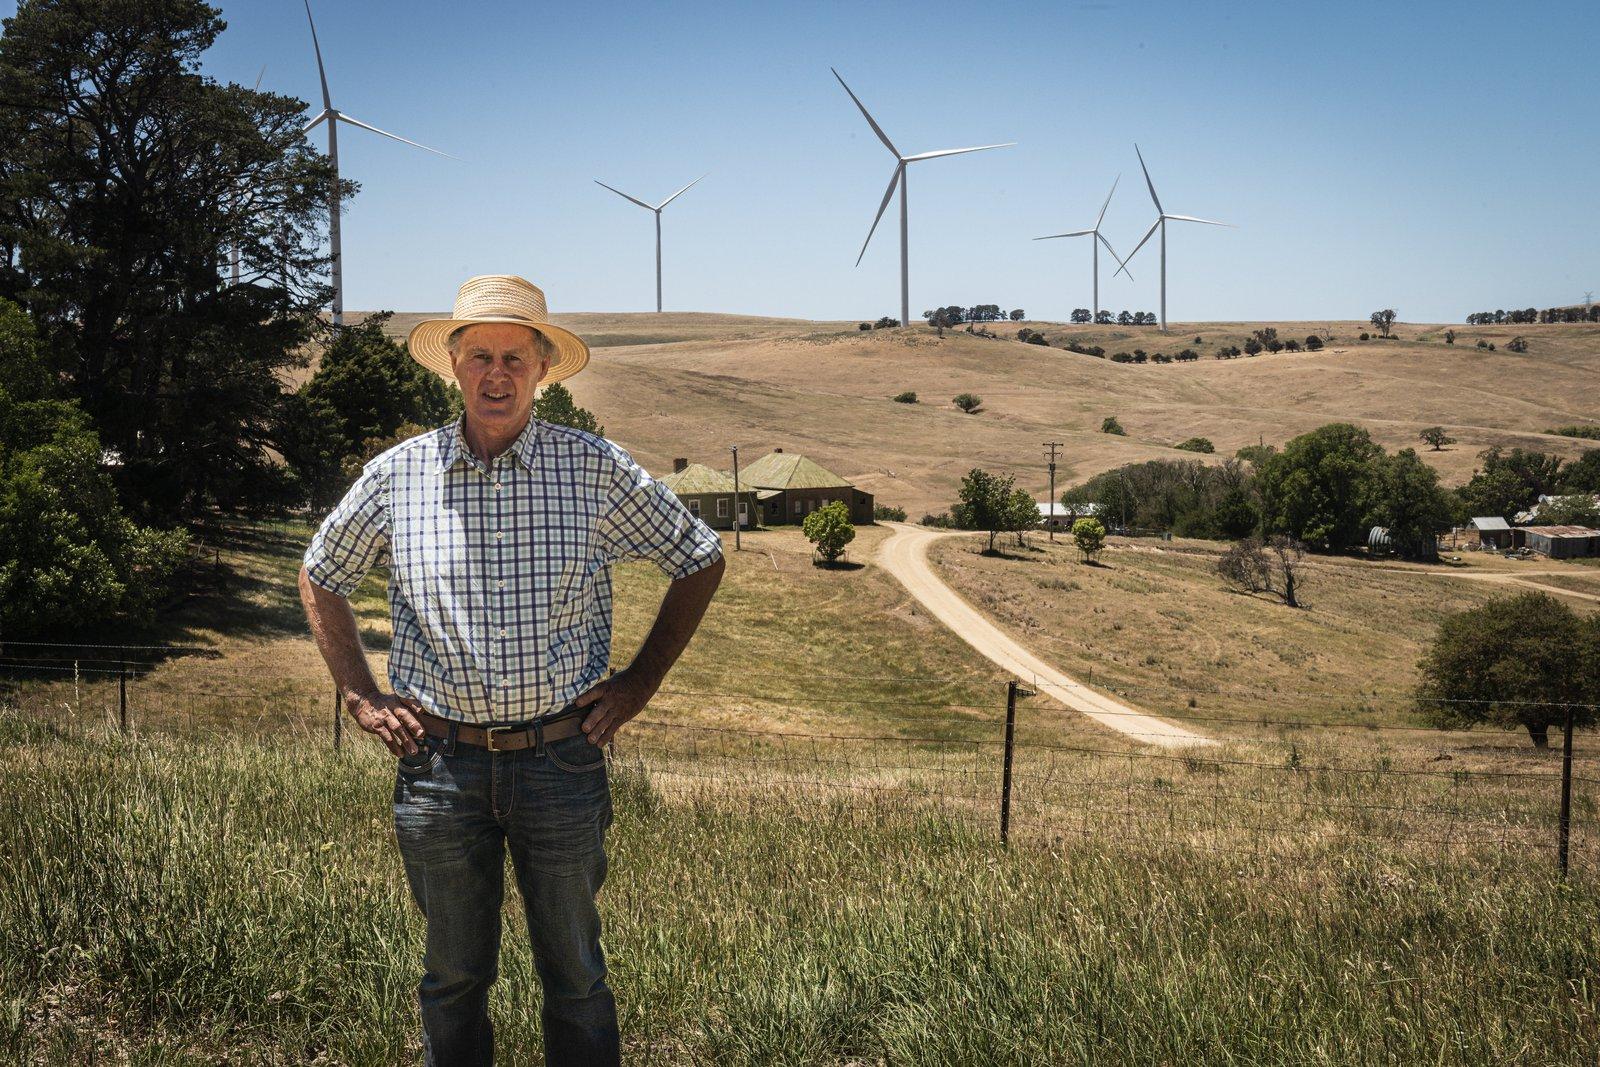 Charlie Prell - Sheep Grazier and Energy Farmer